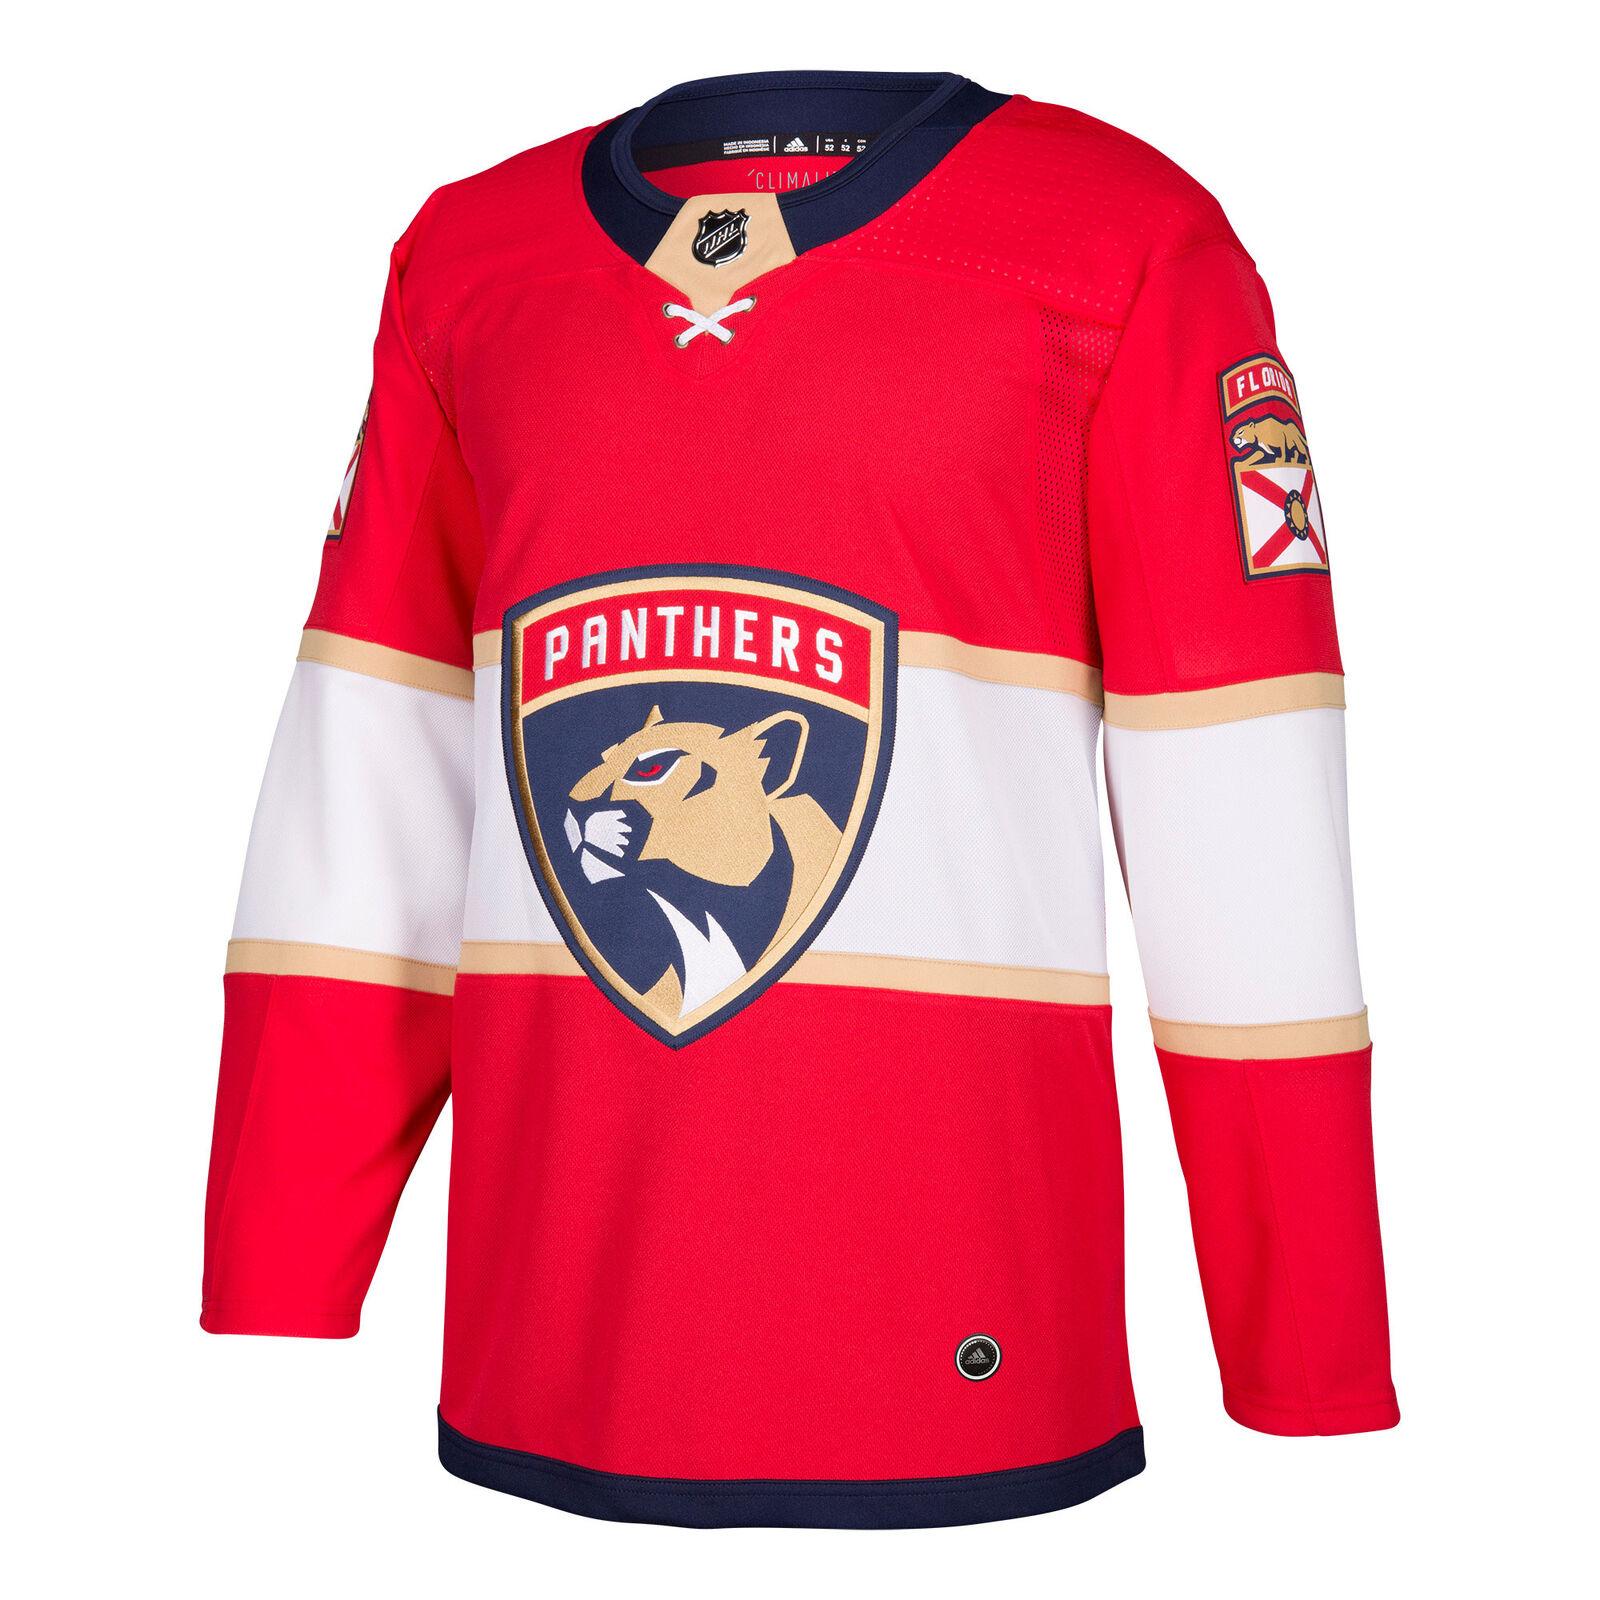 NHL Florida Panthers Adizero Heim Authentisch Pro Trikot Sport Hemd Shirt Unisex